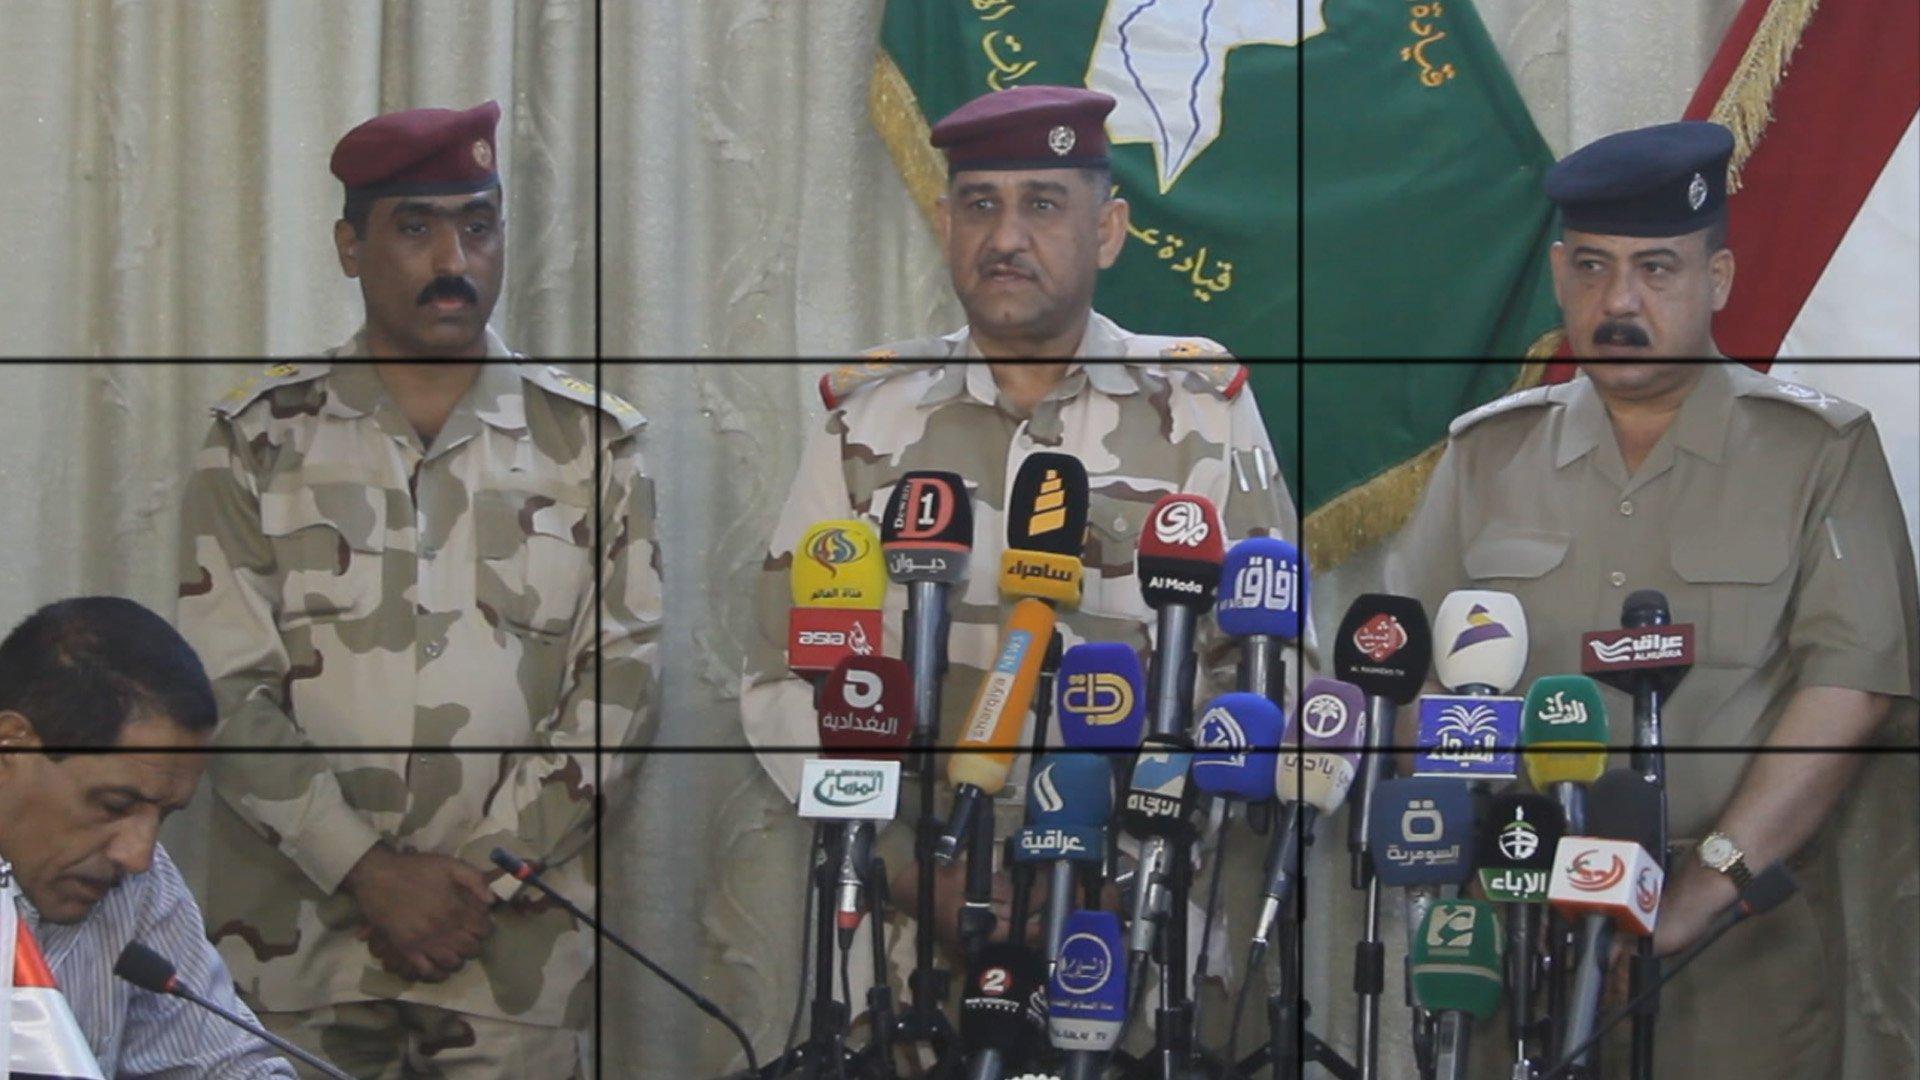 Photo of قيادة عمليات الفرات الأوسط تعلن نجاح الخطة الأمنية الخاصة بزيارة النصف من شعبان